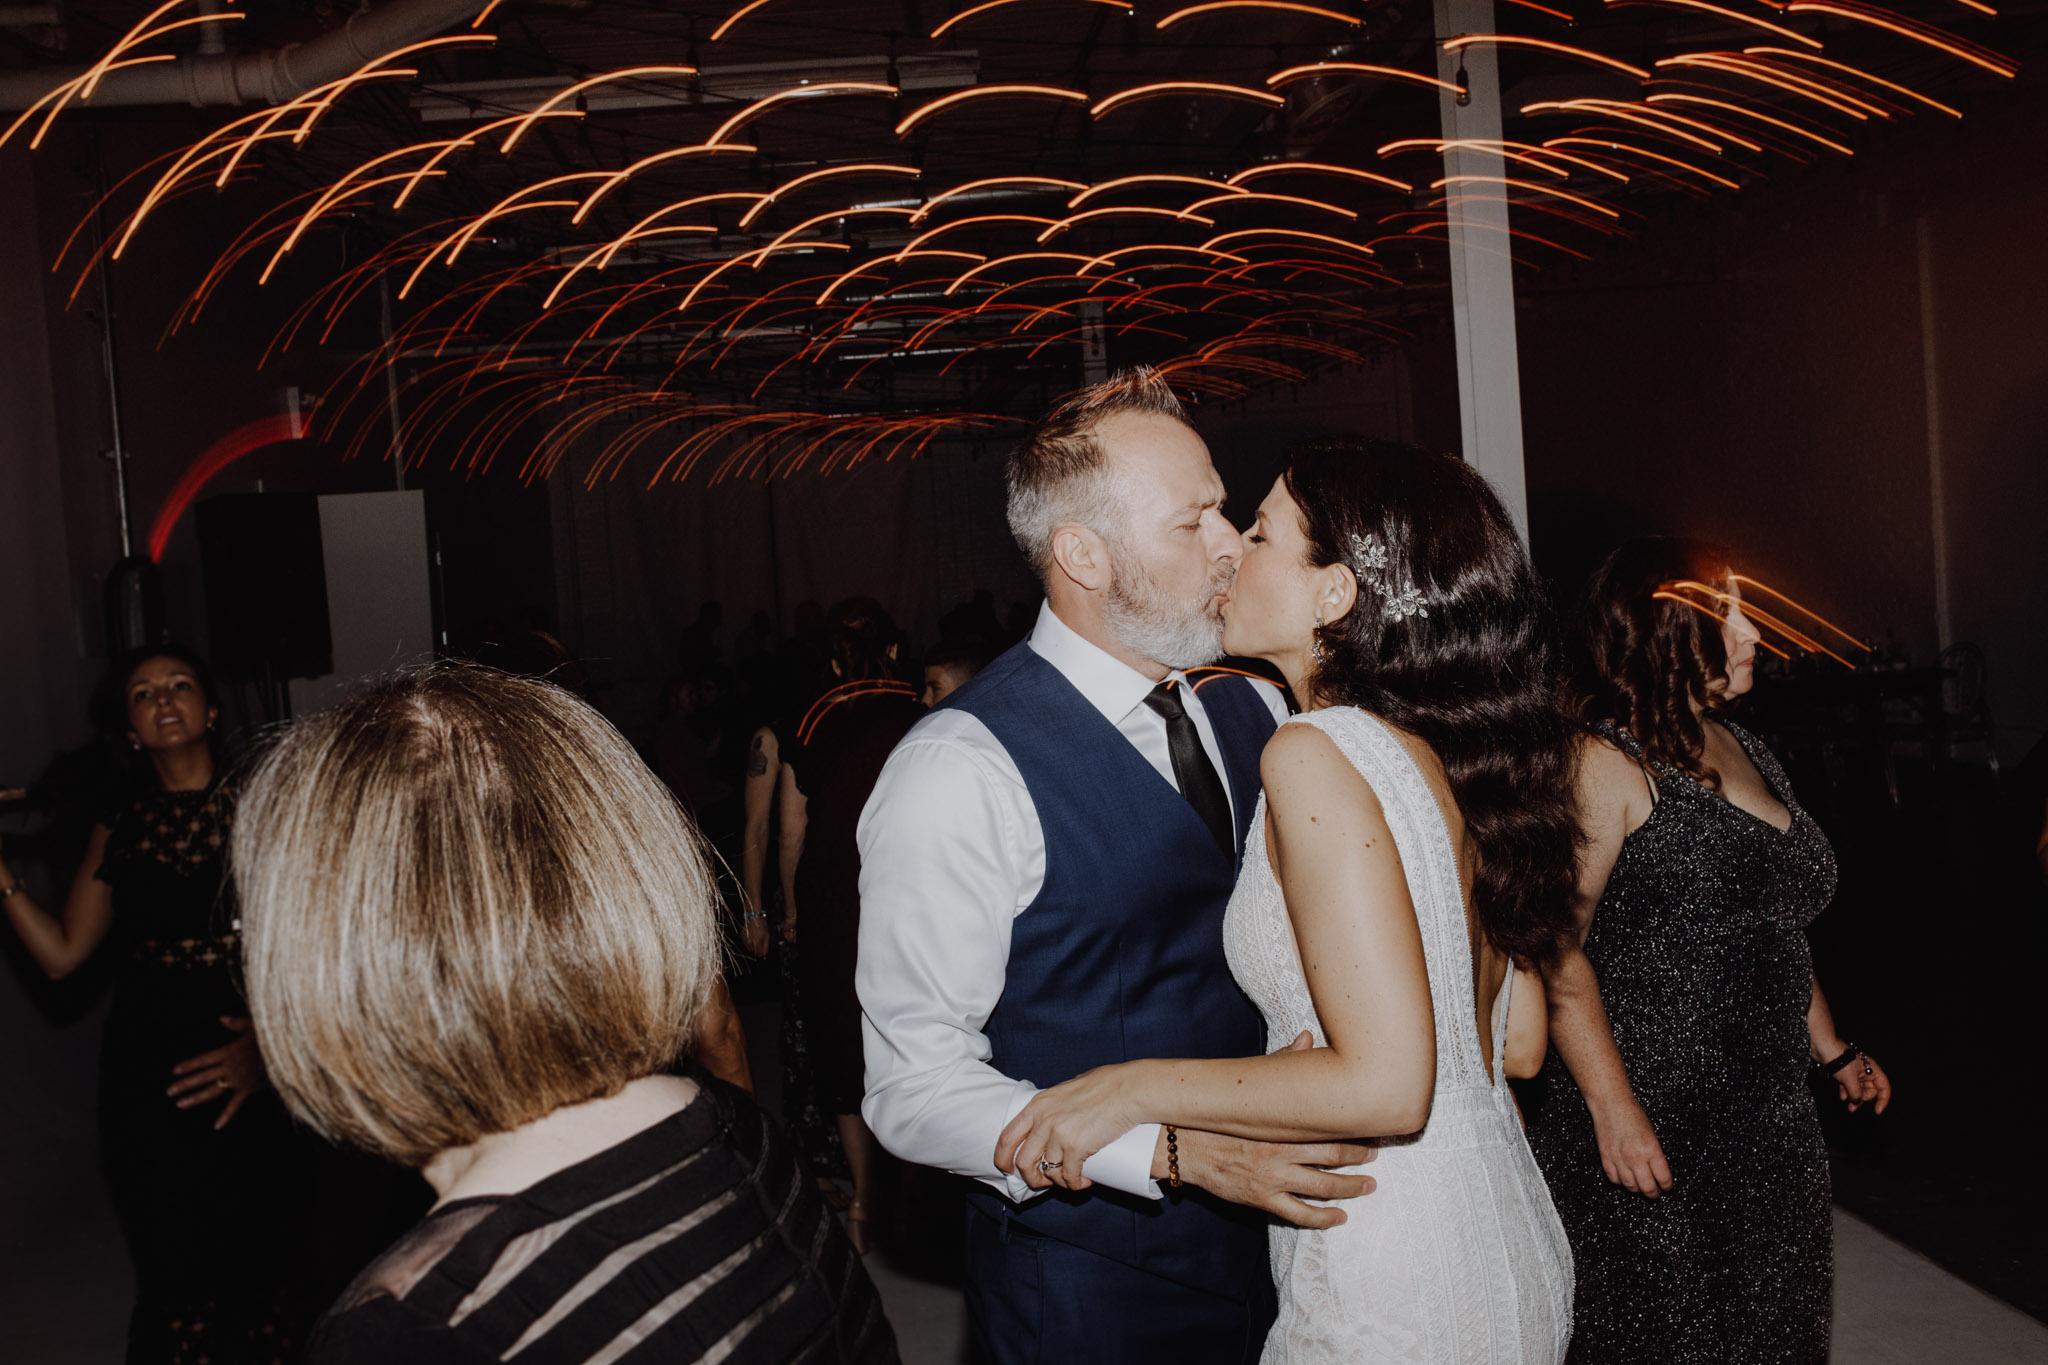 District 28 Wedding Toronto - kissing on the dance floor